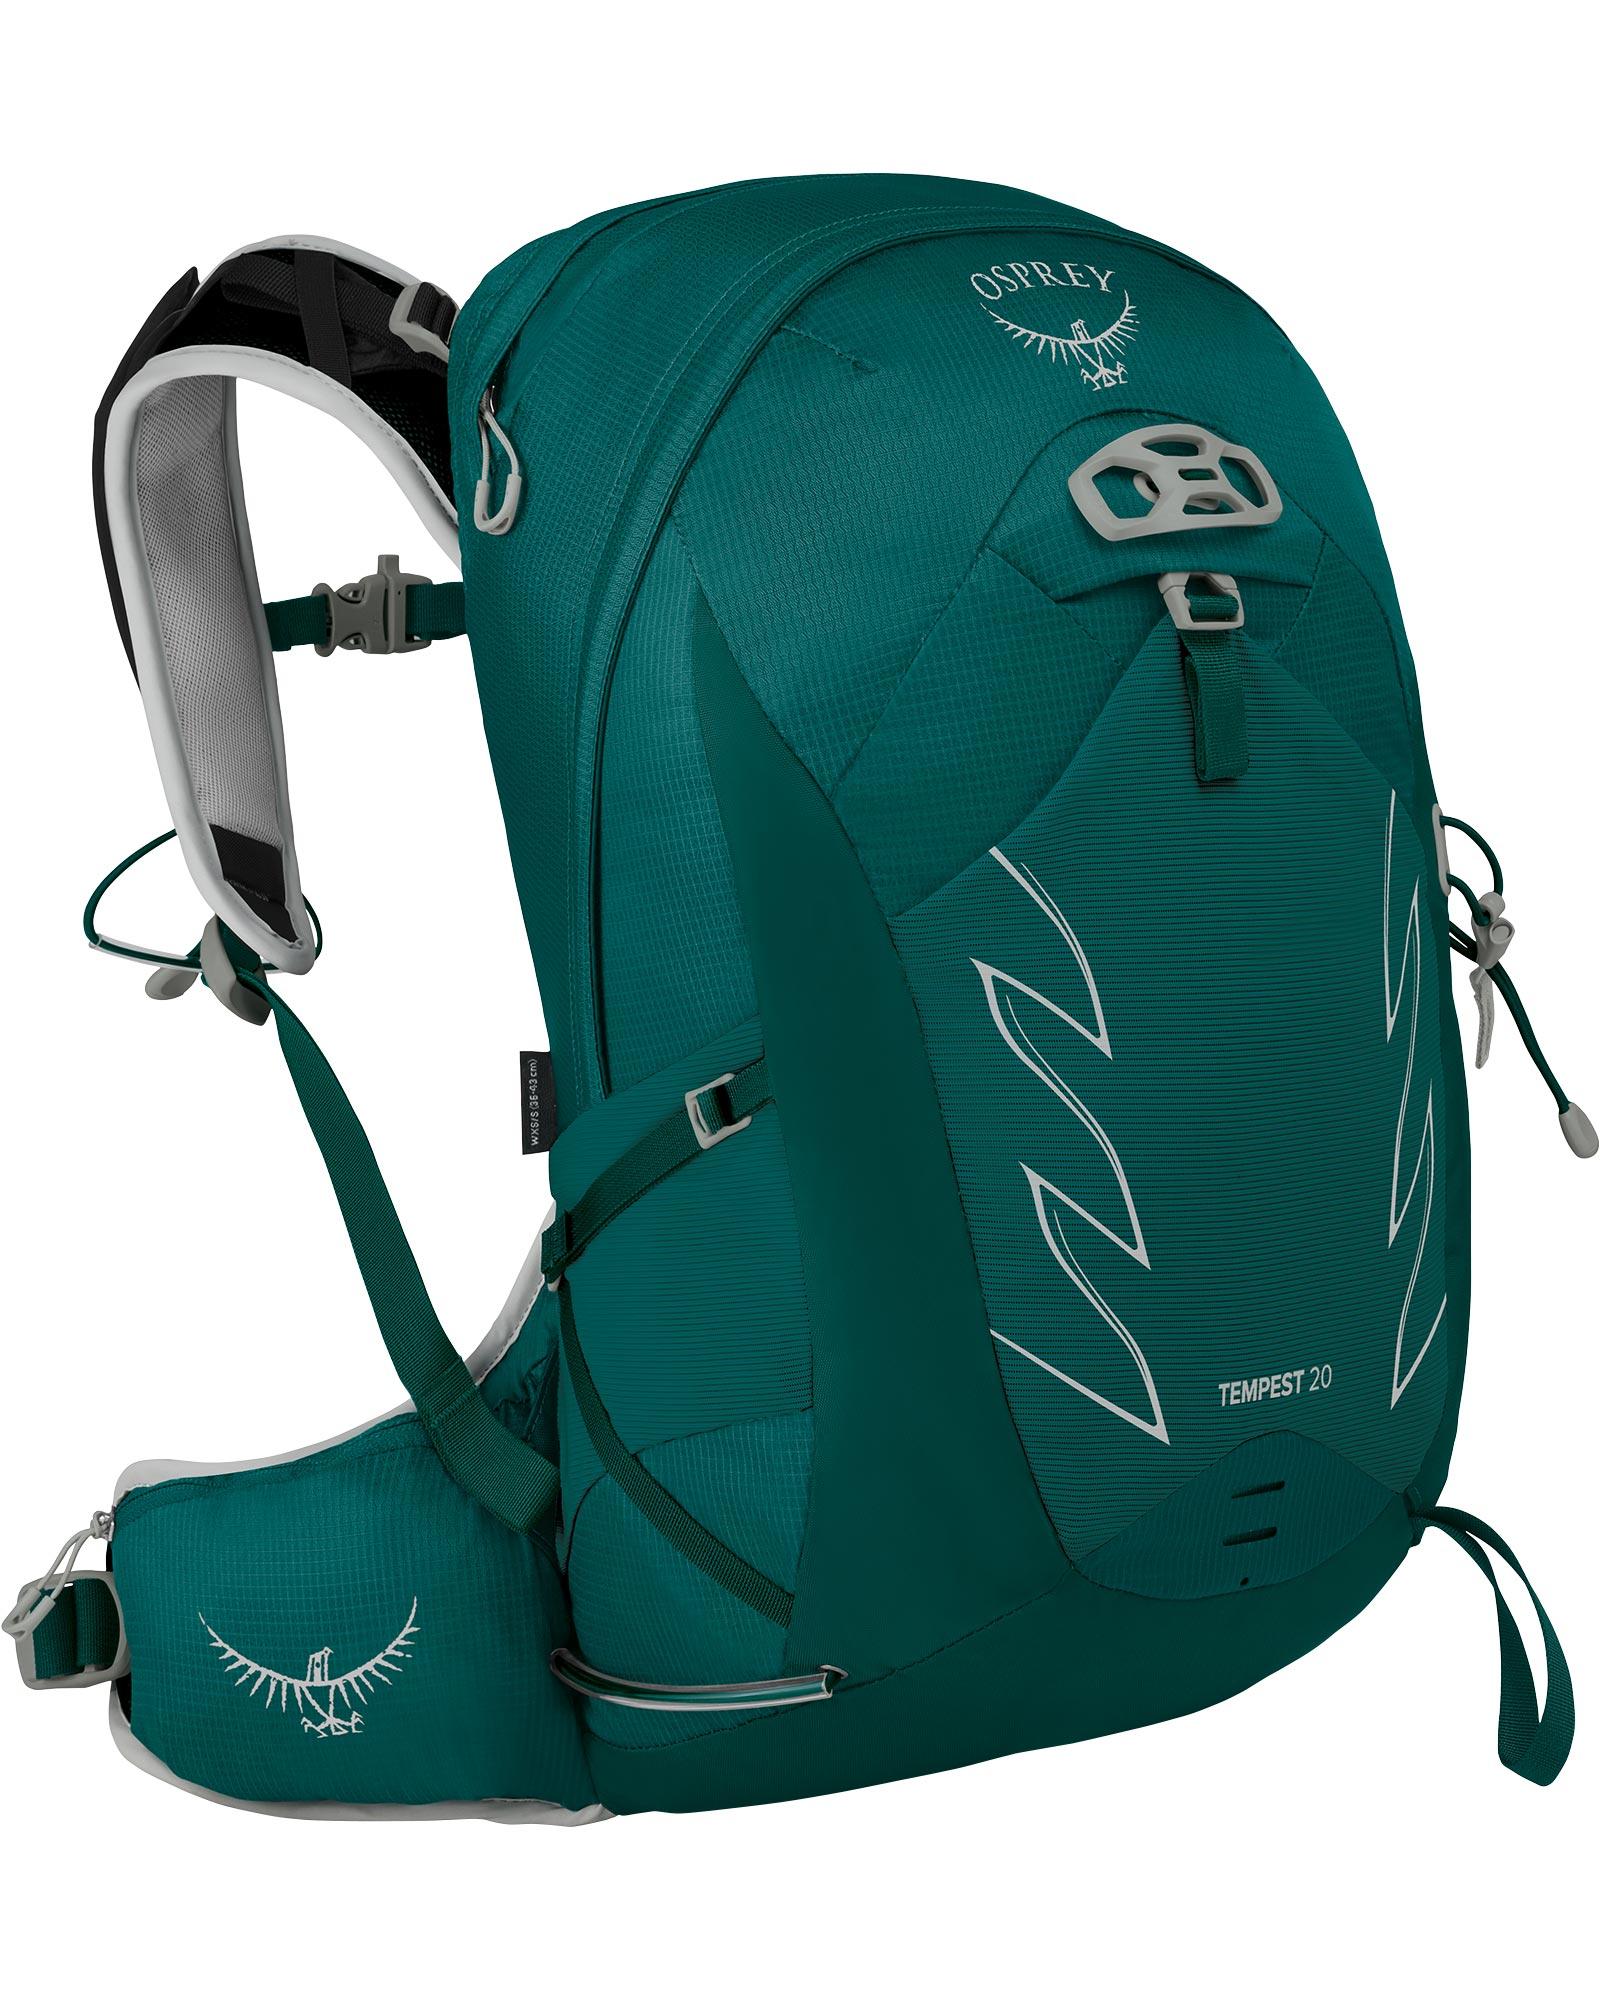 Osprey Women's Tempest 20 Backpack 0